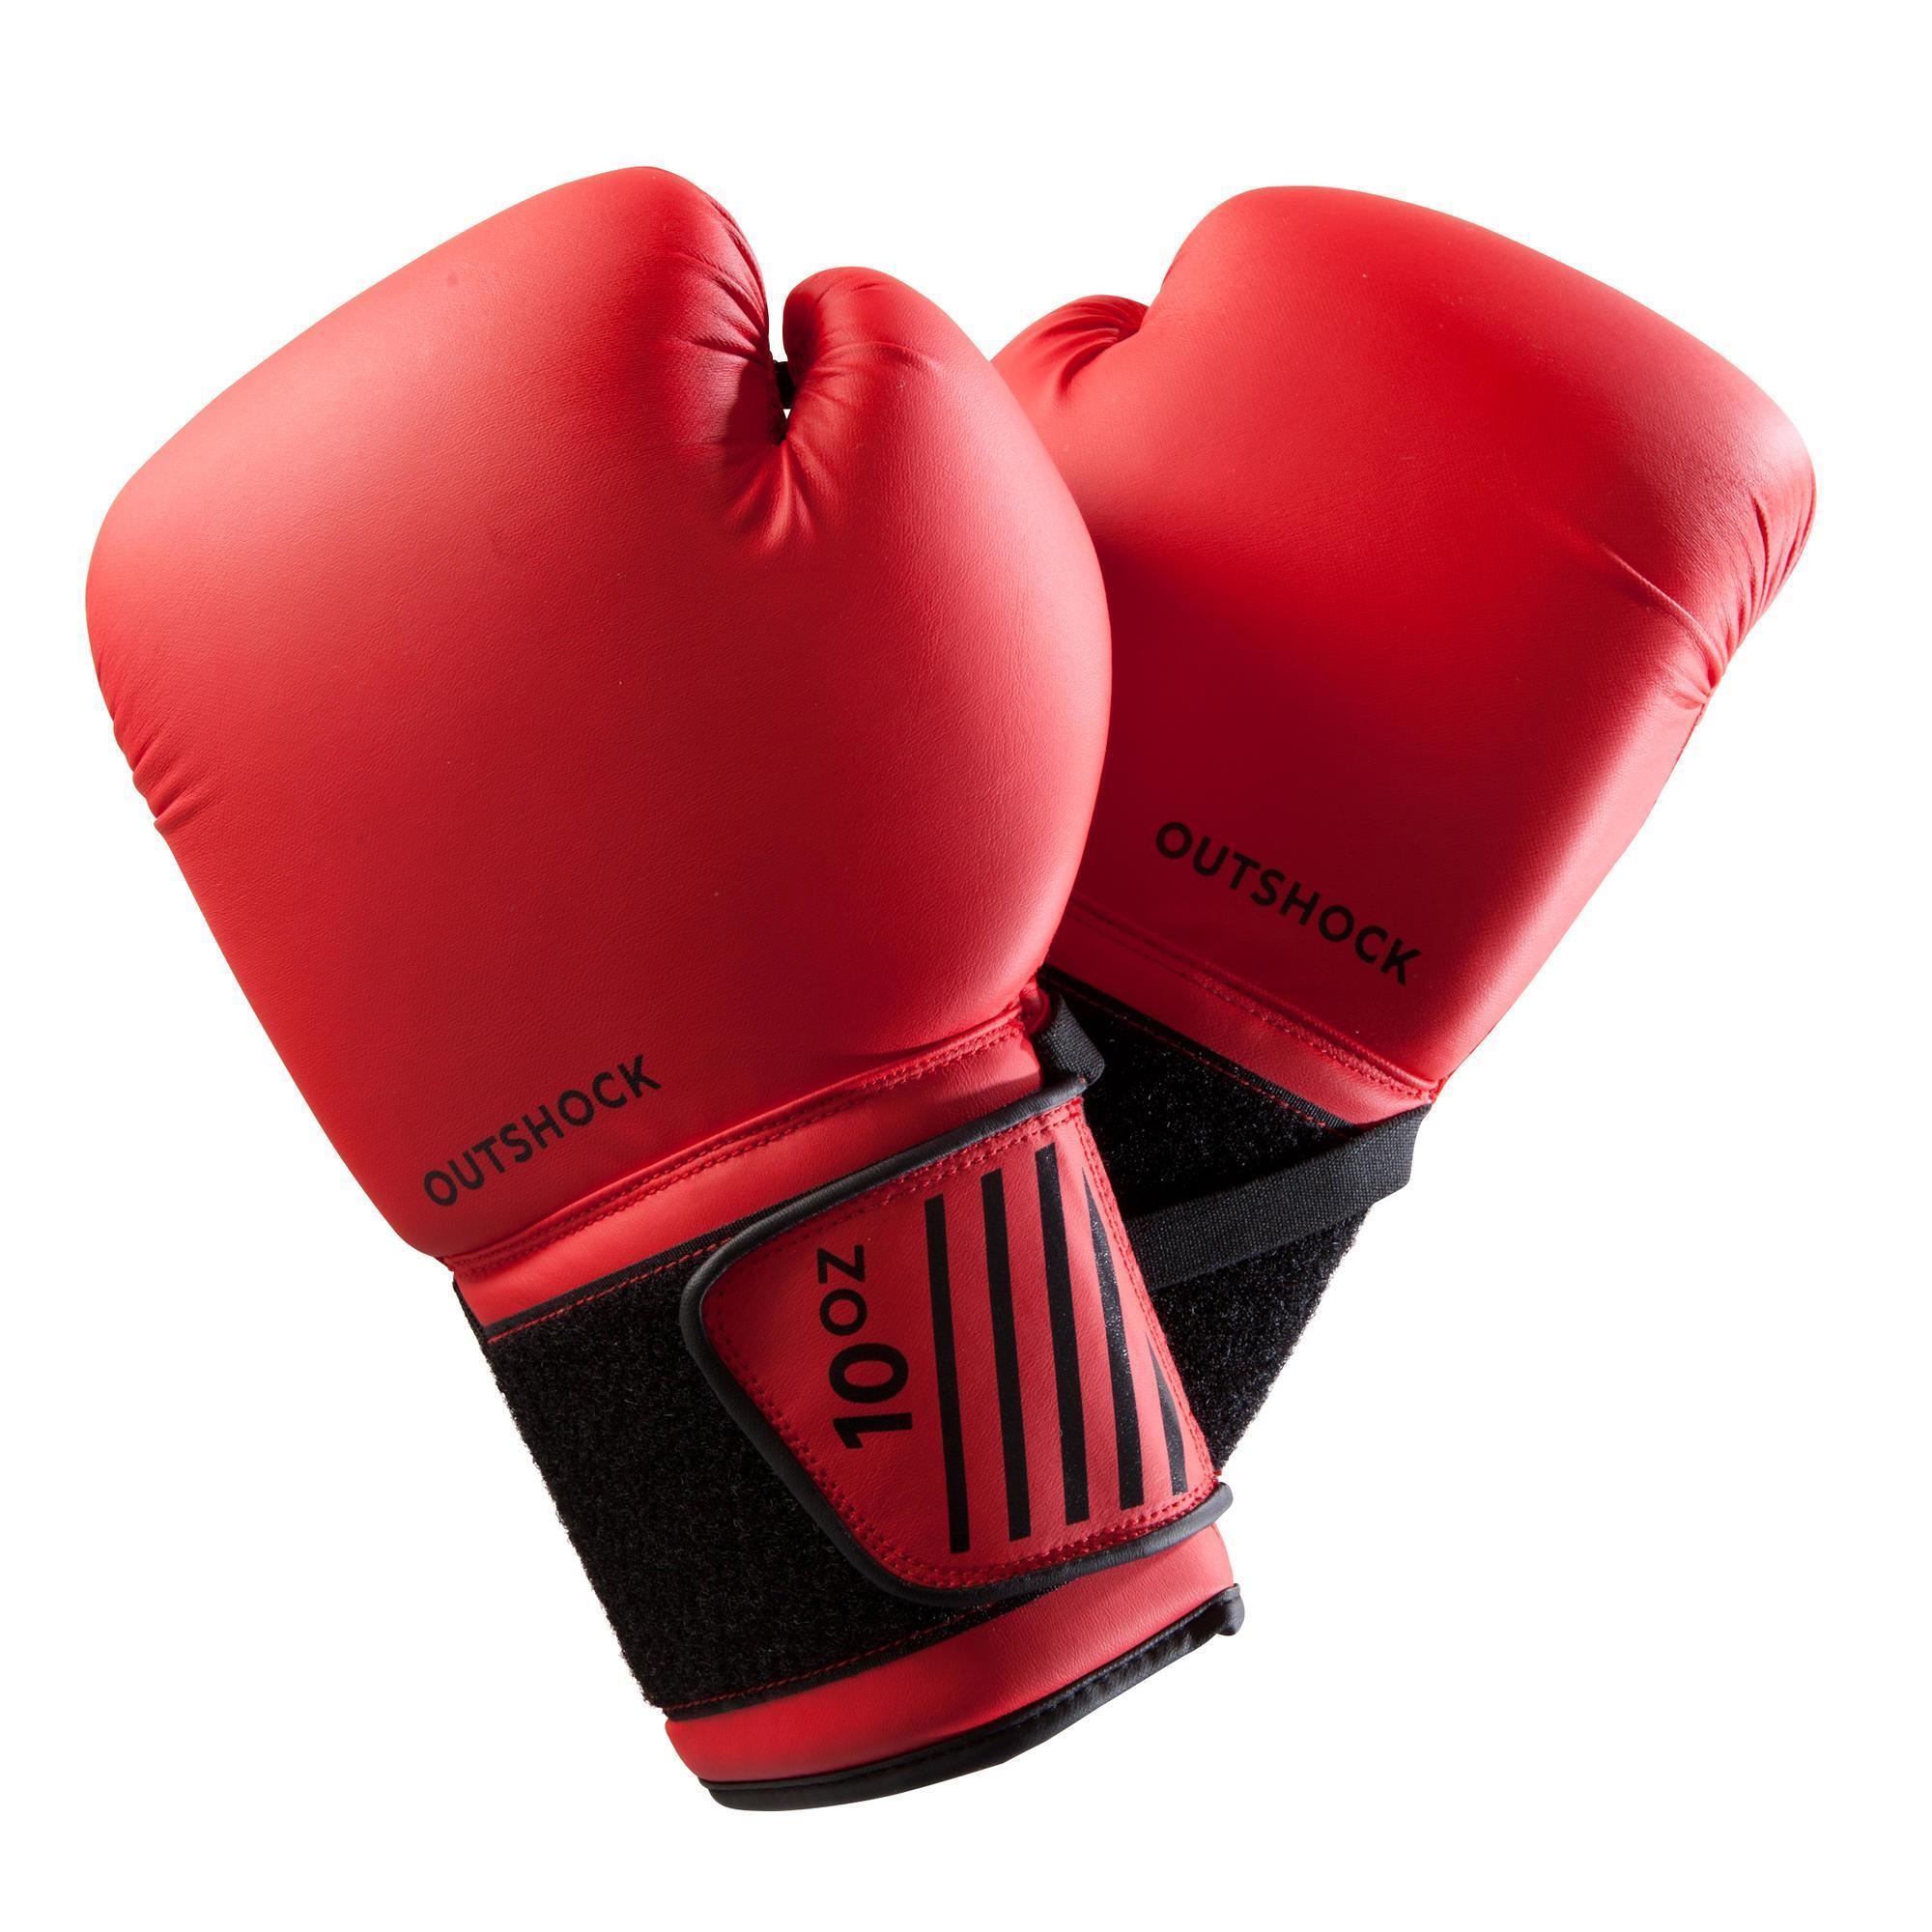 Boxhandschuhe 100 rot Einsteiger | Accessoires > Handschuhe > Sonstige Handschuhe | Outshock